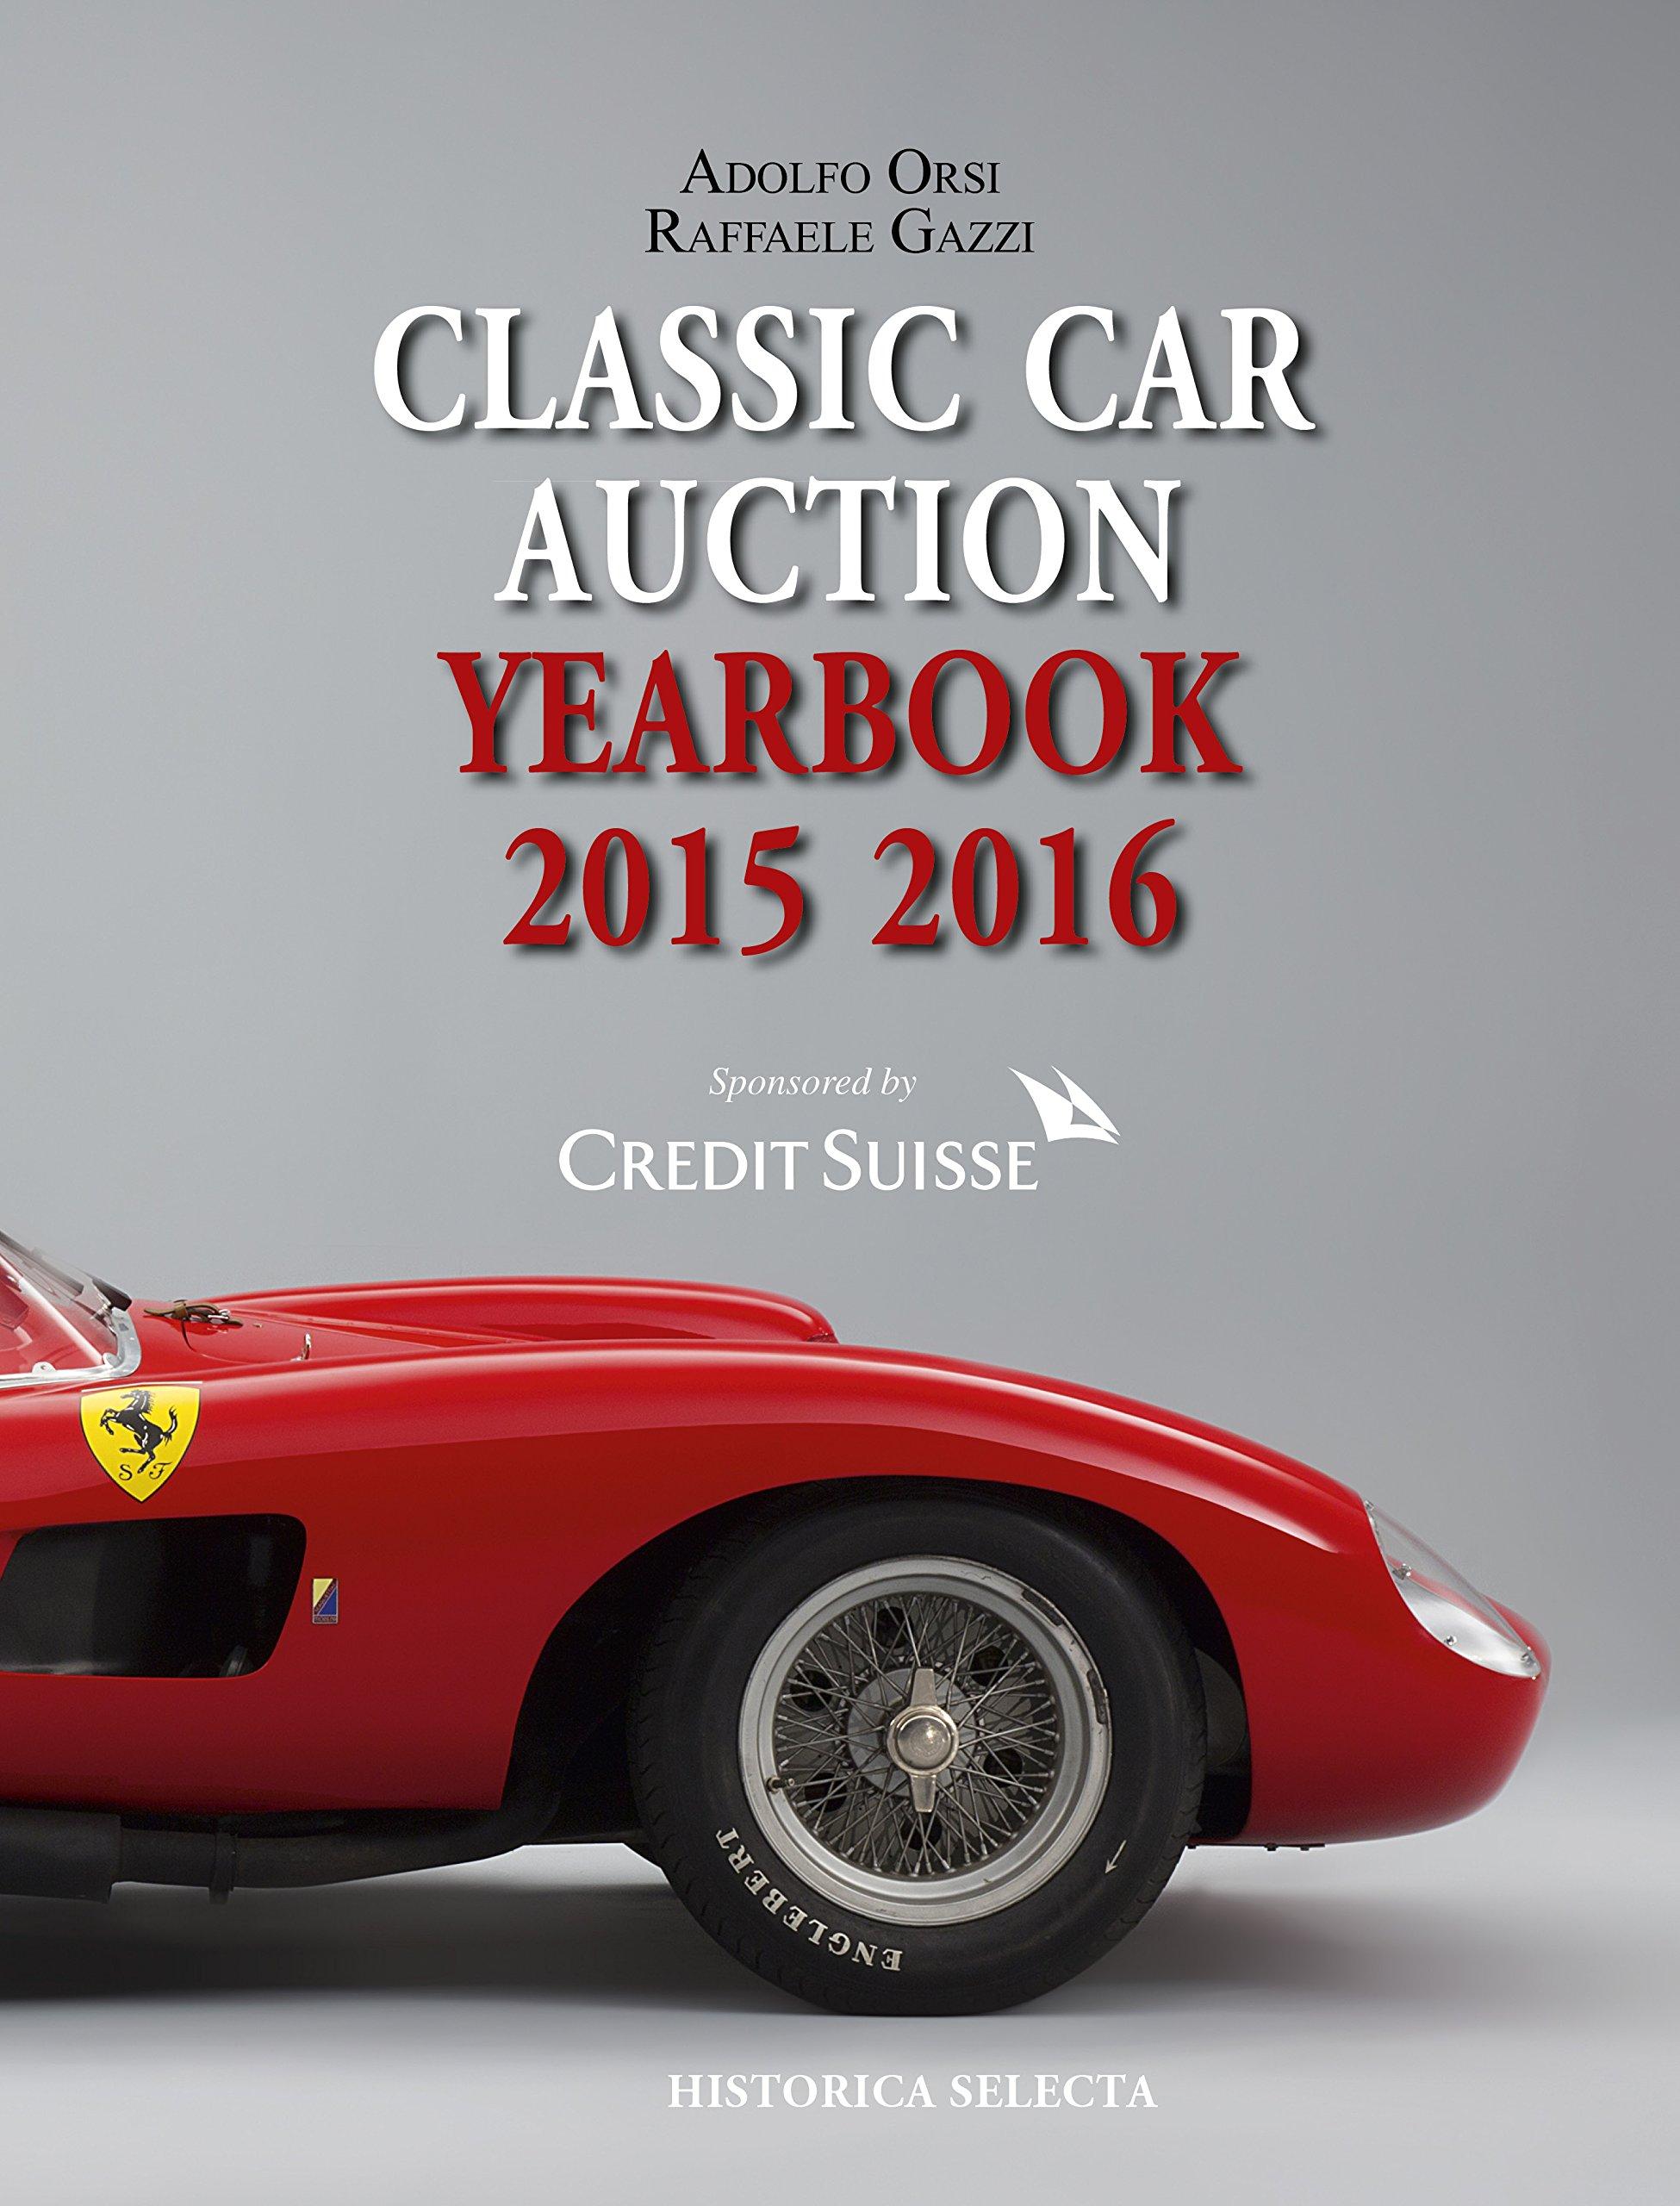 Autobooks-Aerobooks: The World's Fastest Bookstore!